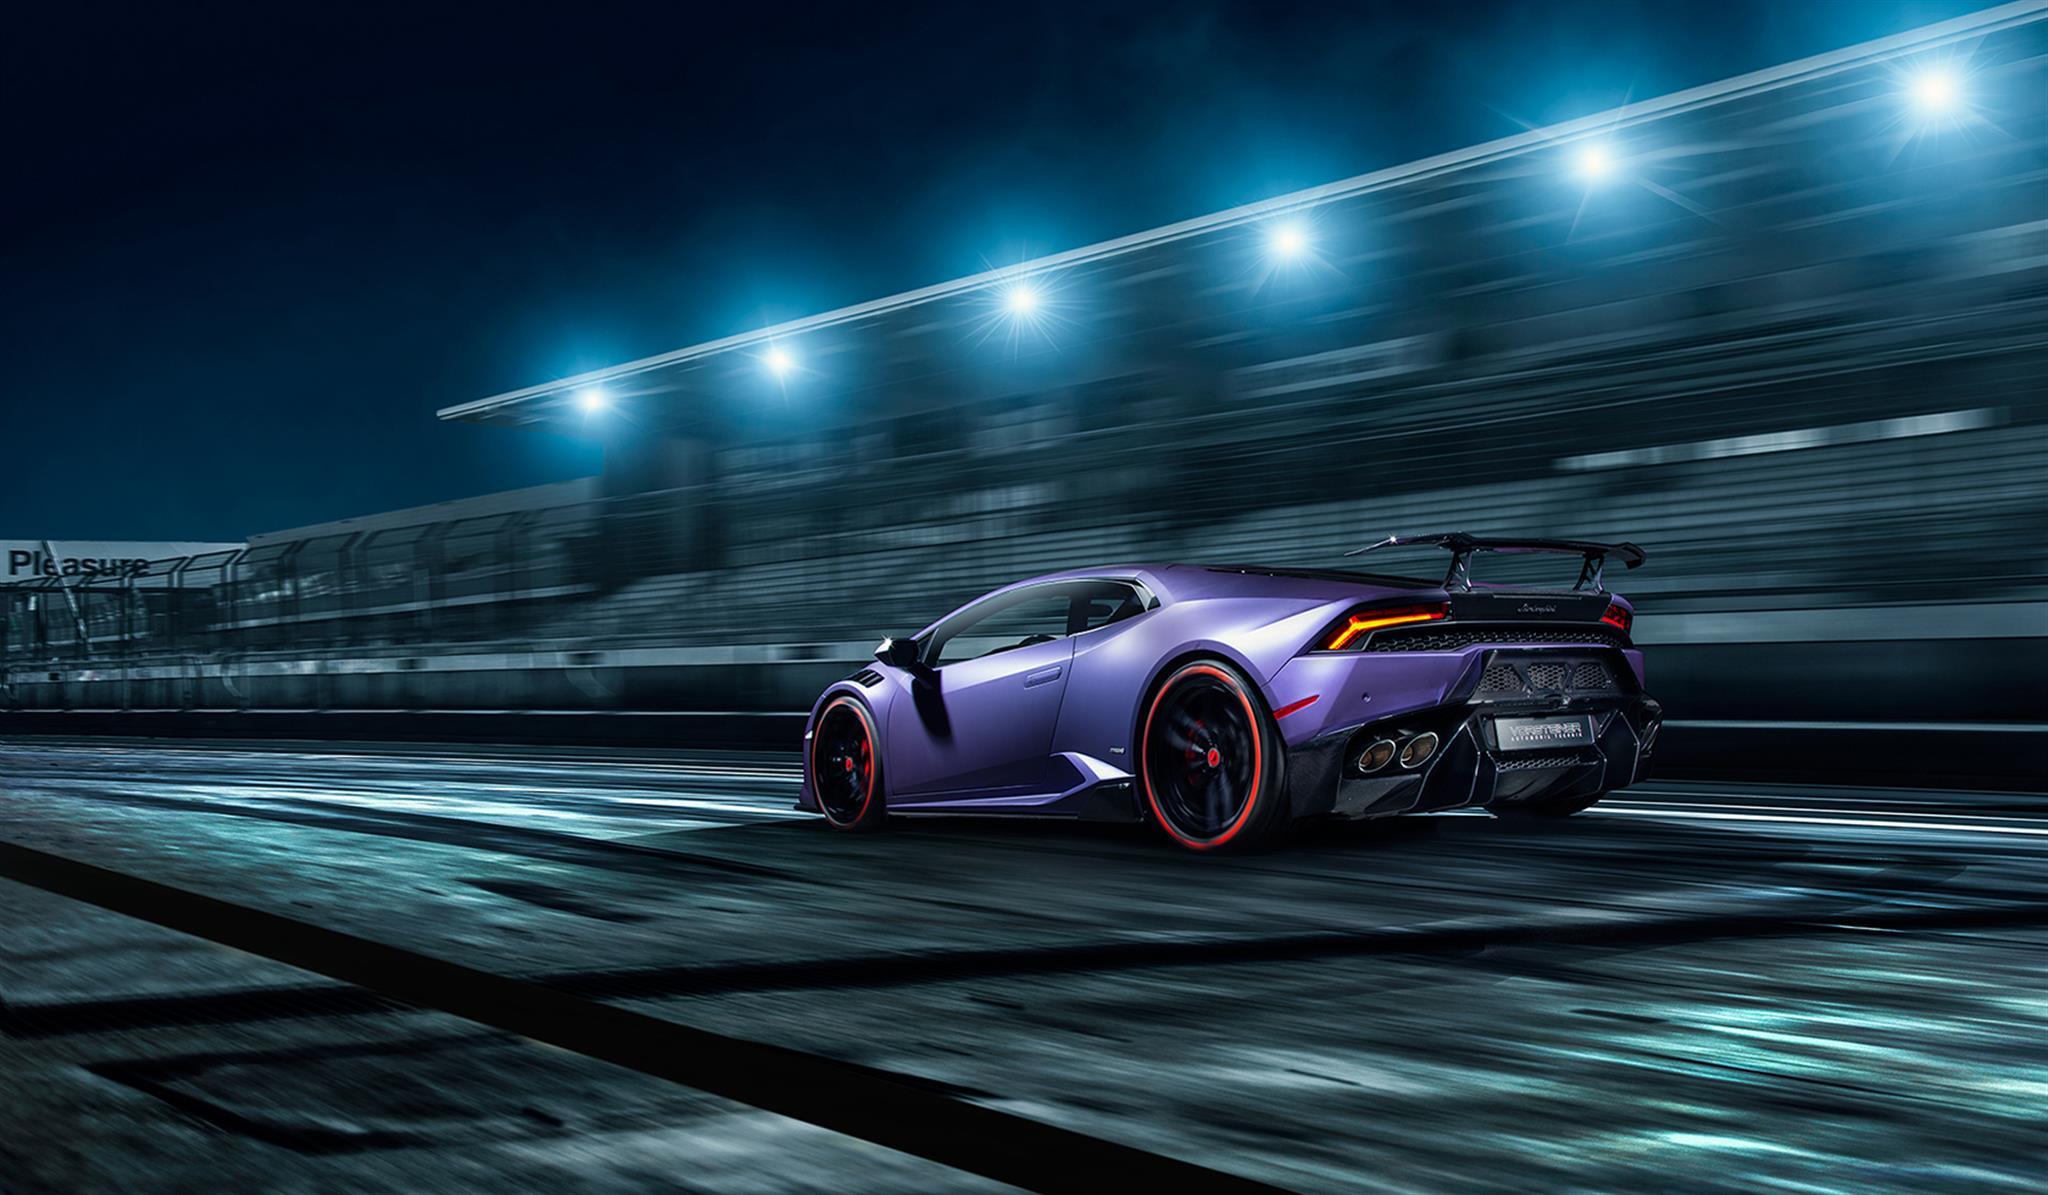 Lamborghini - Huracan -  - Paint -  Wraps & Body